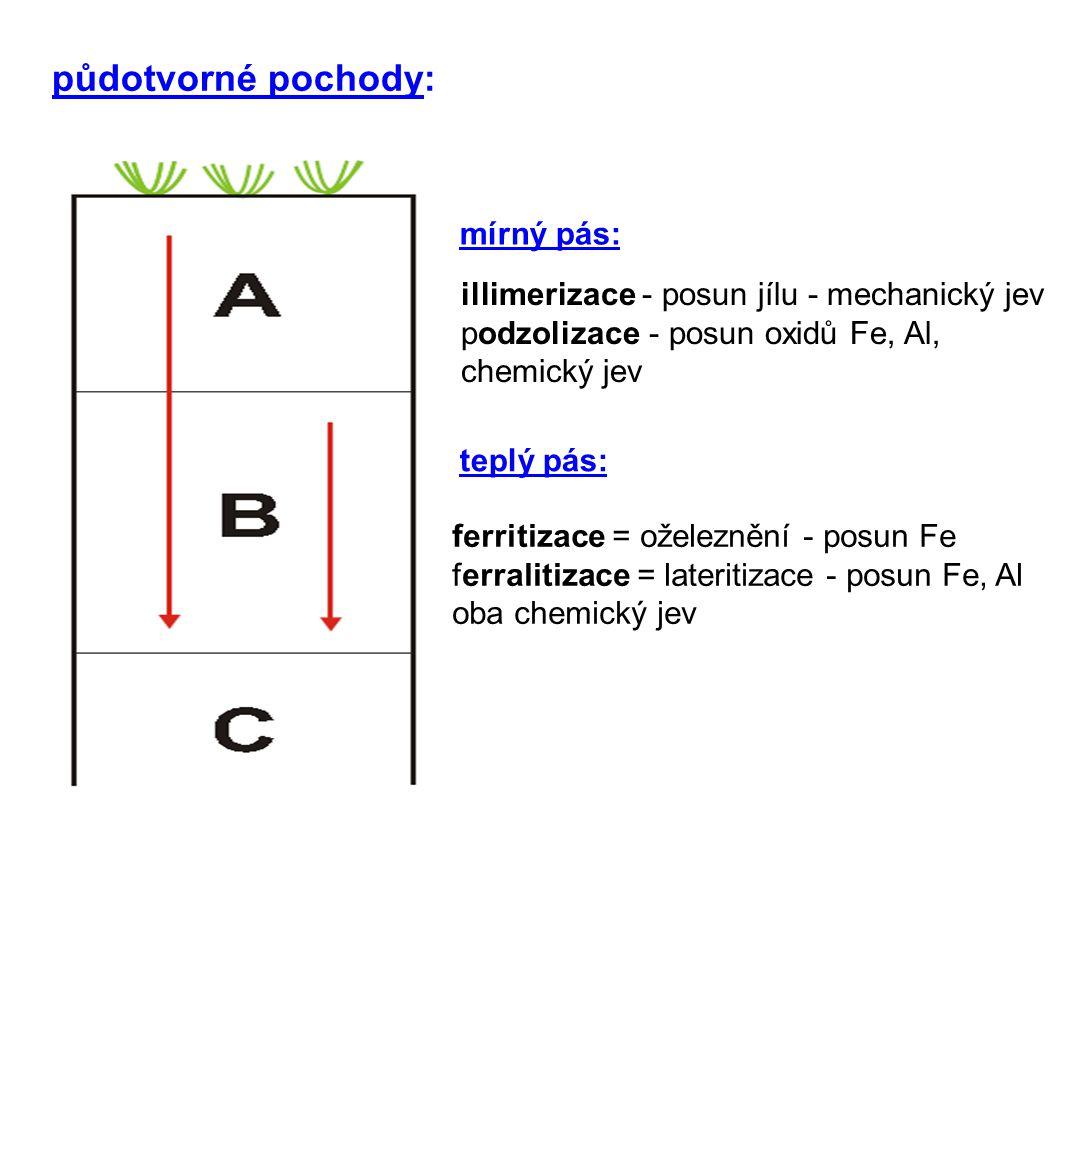 http://www.voderek.cz/prirodopis/ekoprirodopis9/p913/p913_soubory/image004.gif černozem A - horizont humusový C - matečná hornina - spraš